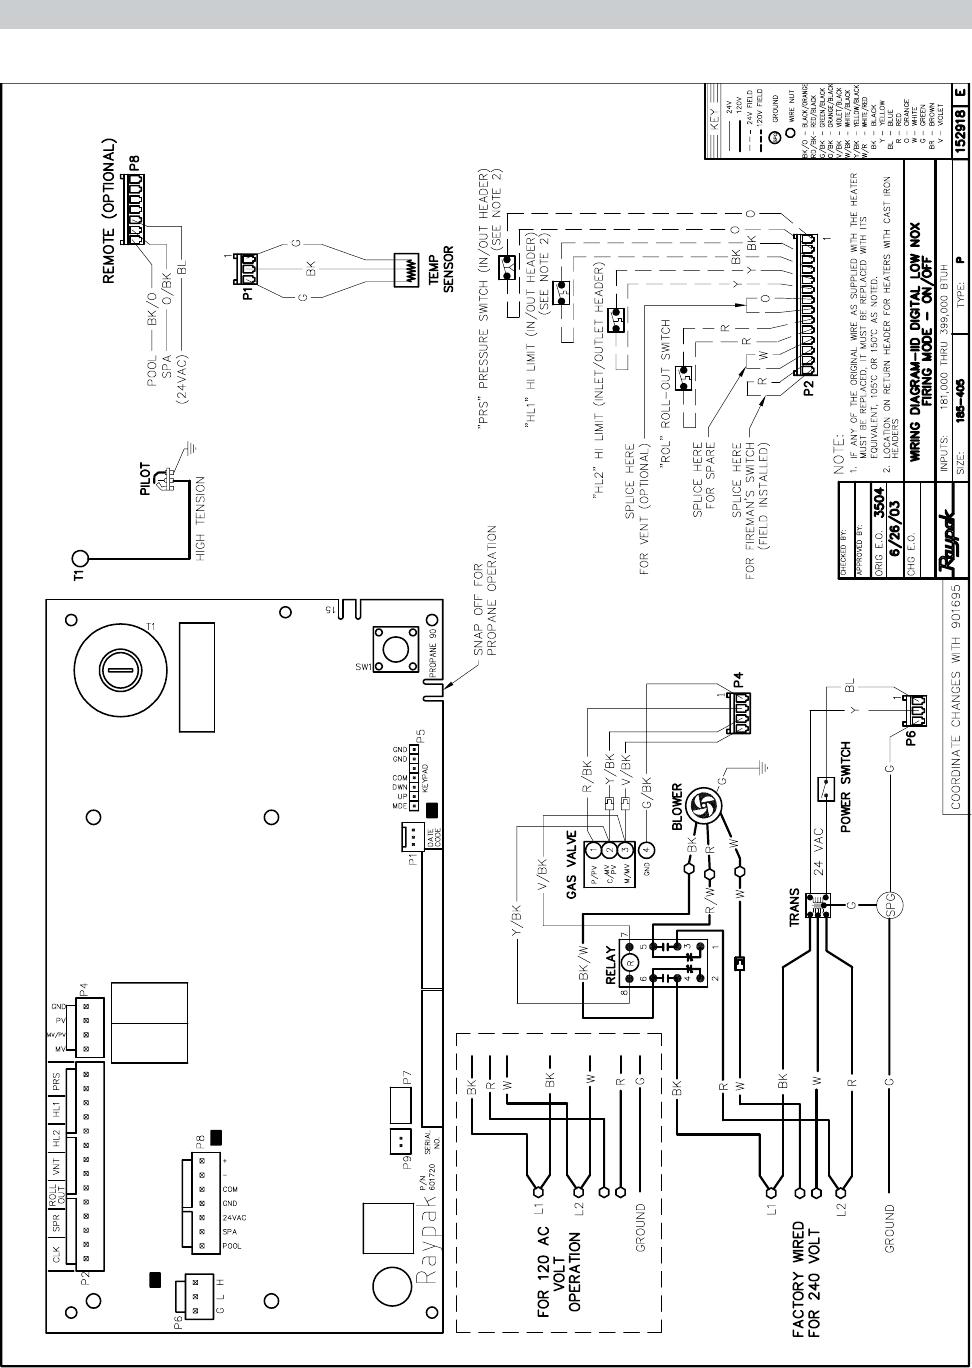 raypak boiler wiring diagram vb 4567  raypak remote wiring diagram wiring diagram  raypak remote wiring diagram wiring diagram